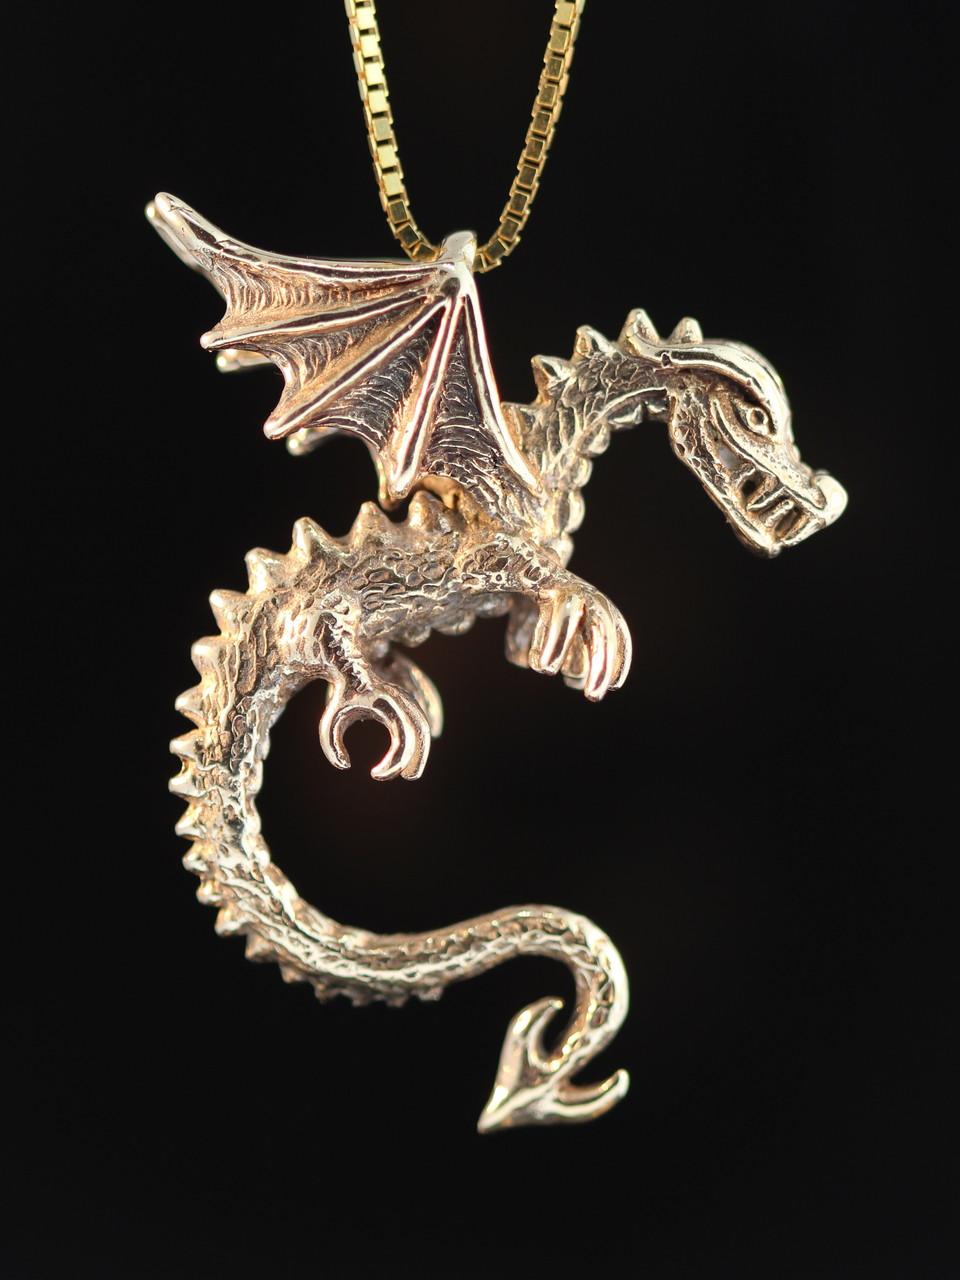 Gold dragon spike the dragon pendant 14k gold marty magic store gold dragon spike the dragon pendant 14k gold aloadofball Choice Image